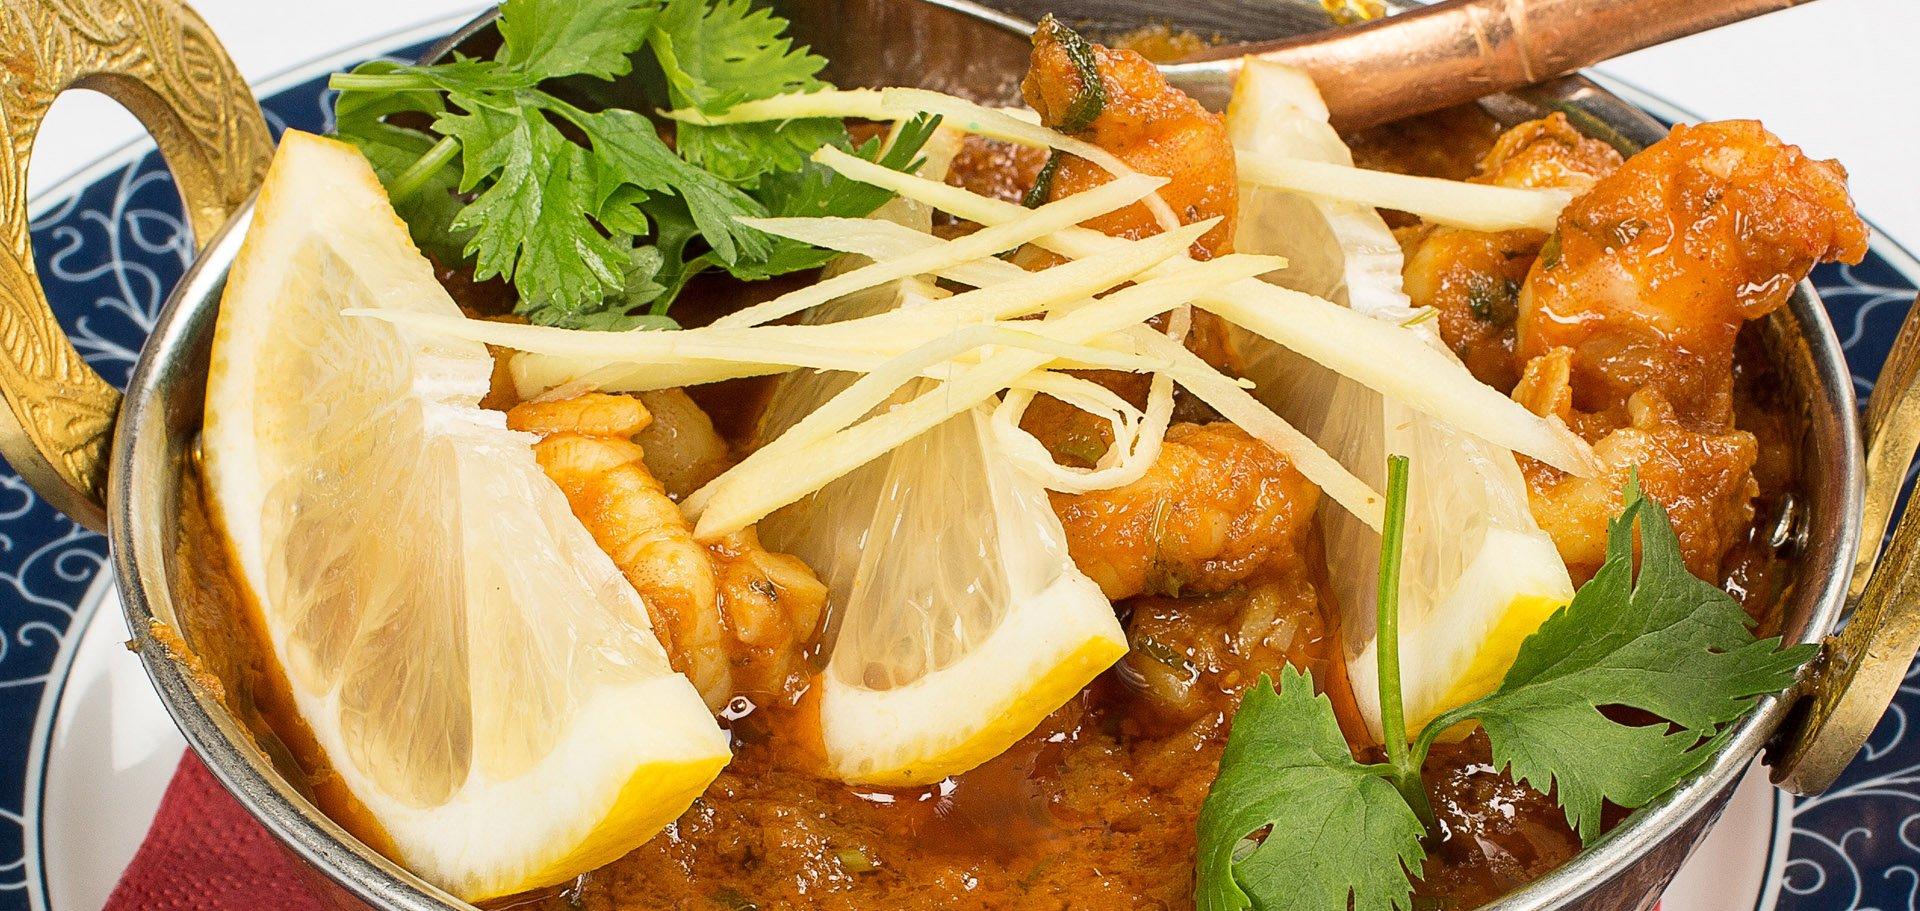 Pleasant Indian And European Cuisine Houston Amar Indian European Download Free Architecture Designs Scobabritishbridgeorg